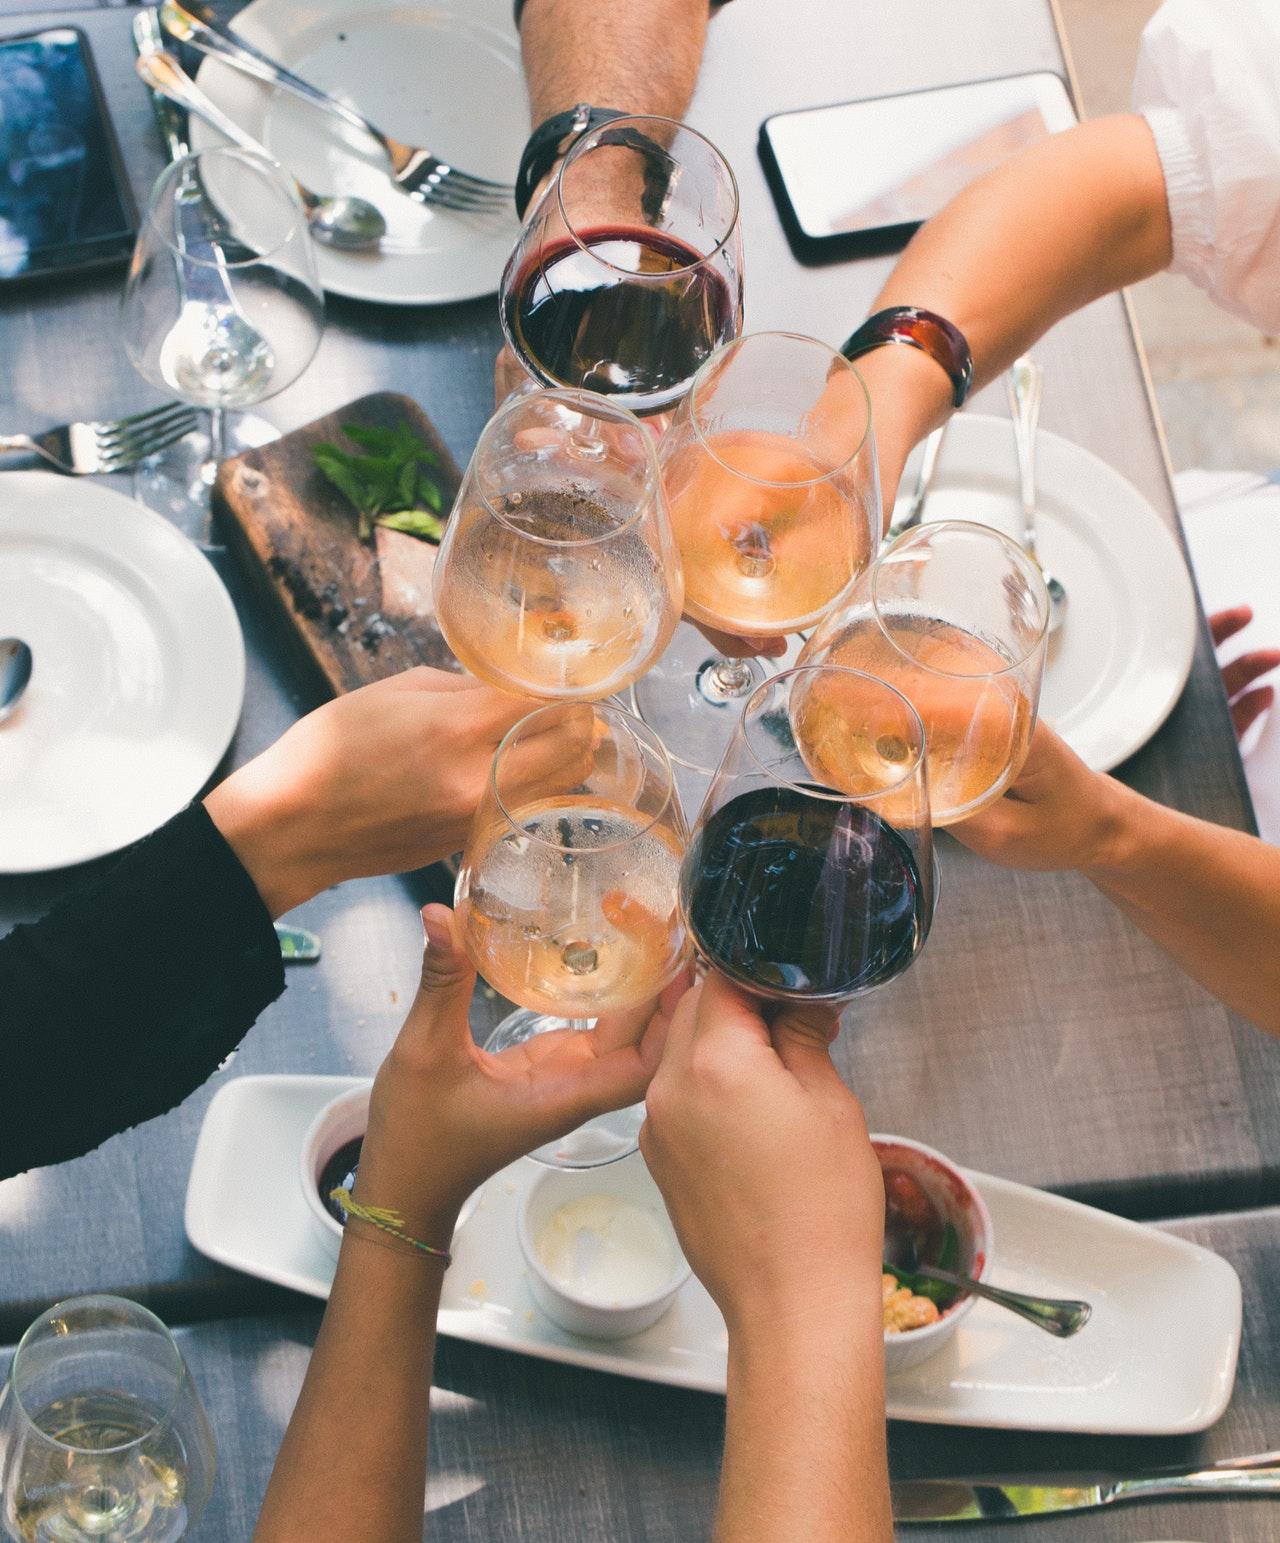 celebration-cheers-drinking-glasses-1097425(2).jpg